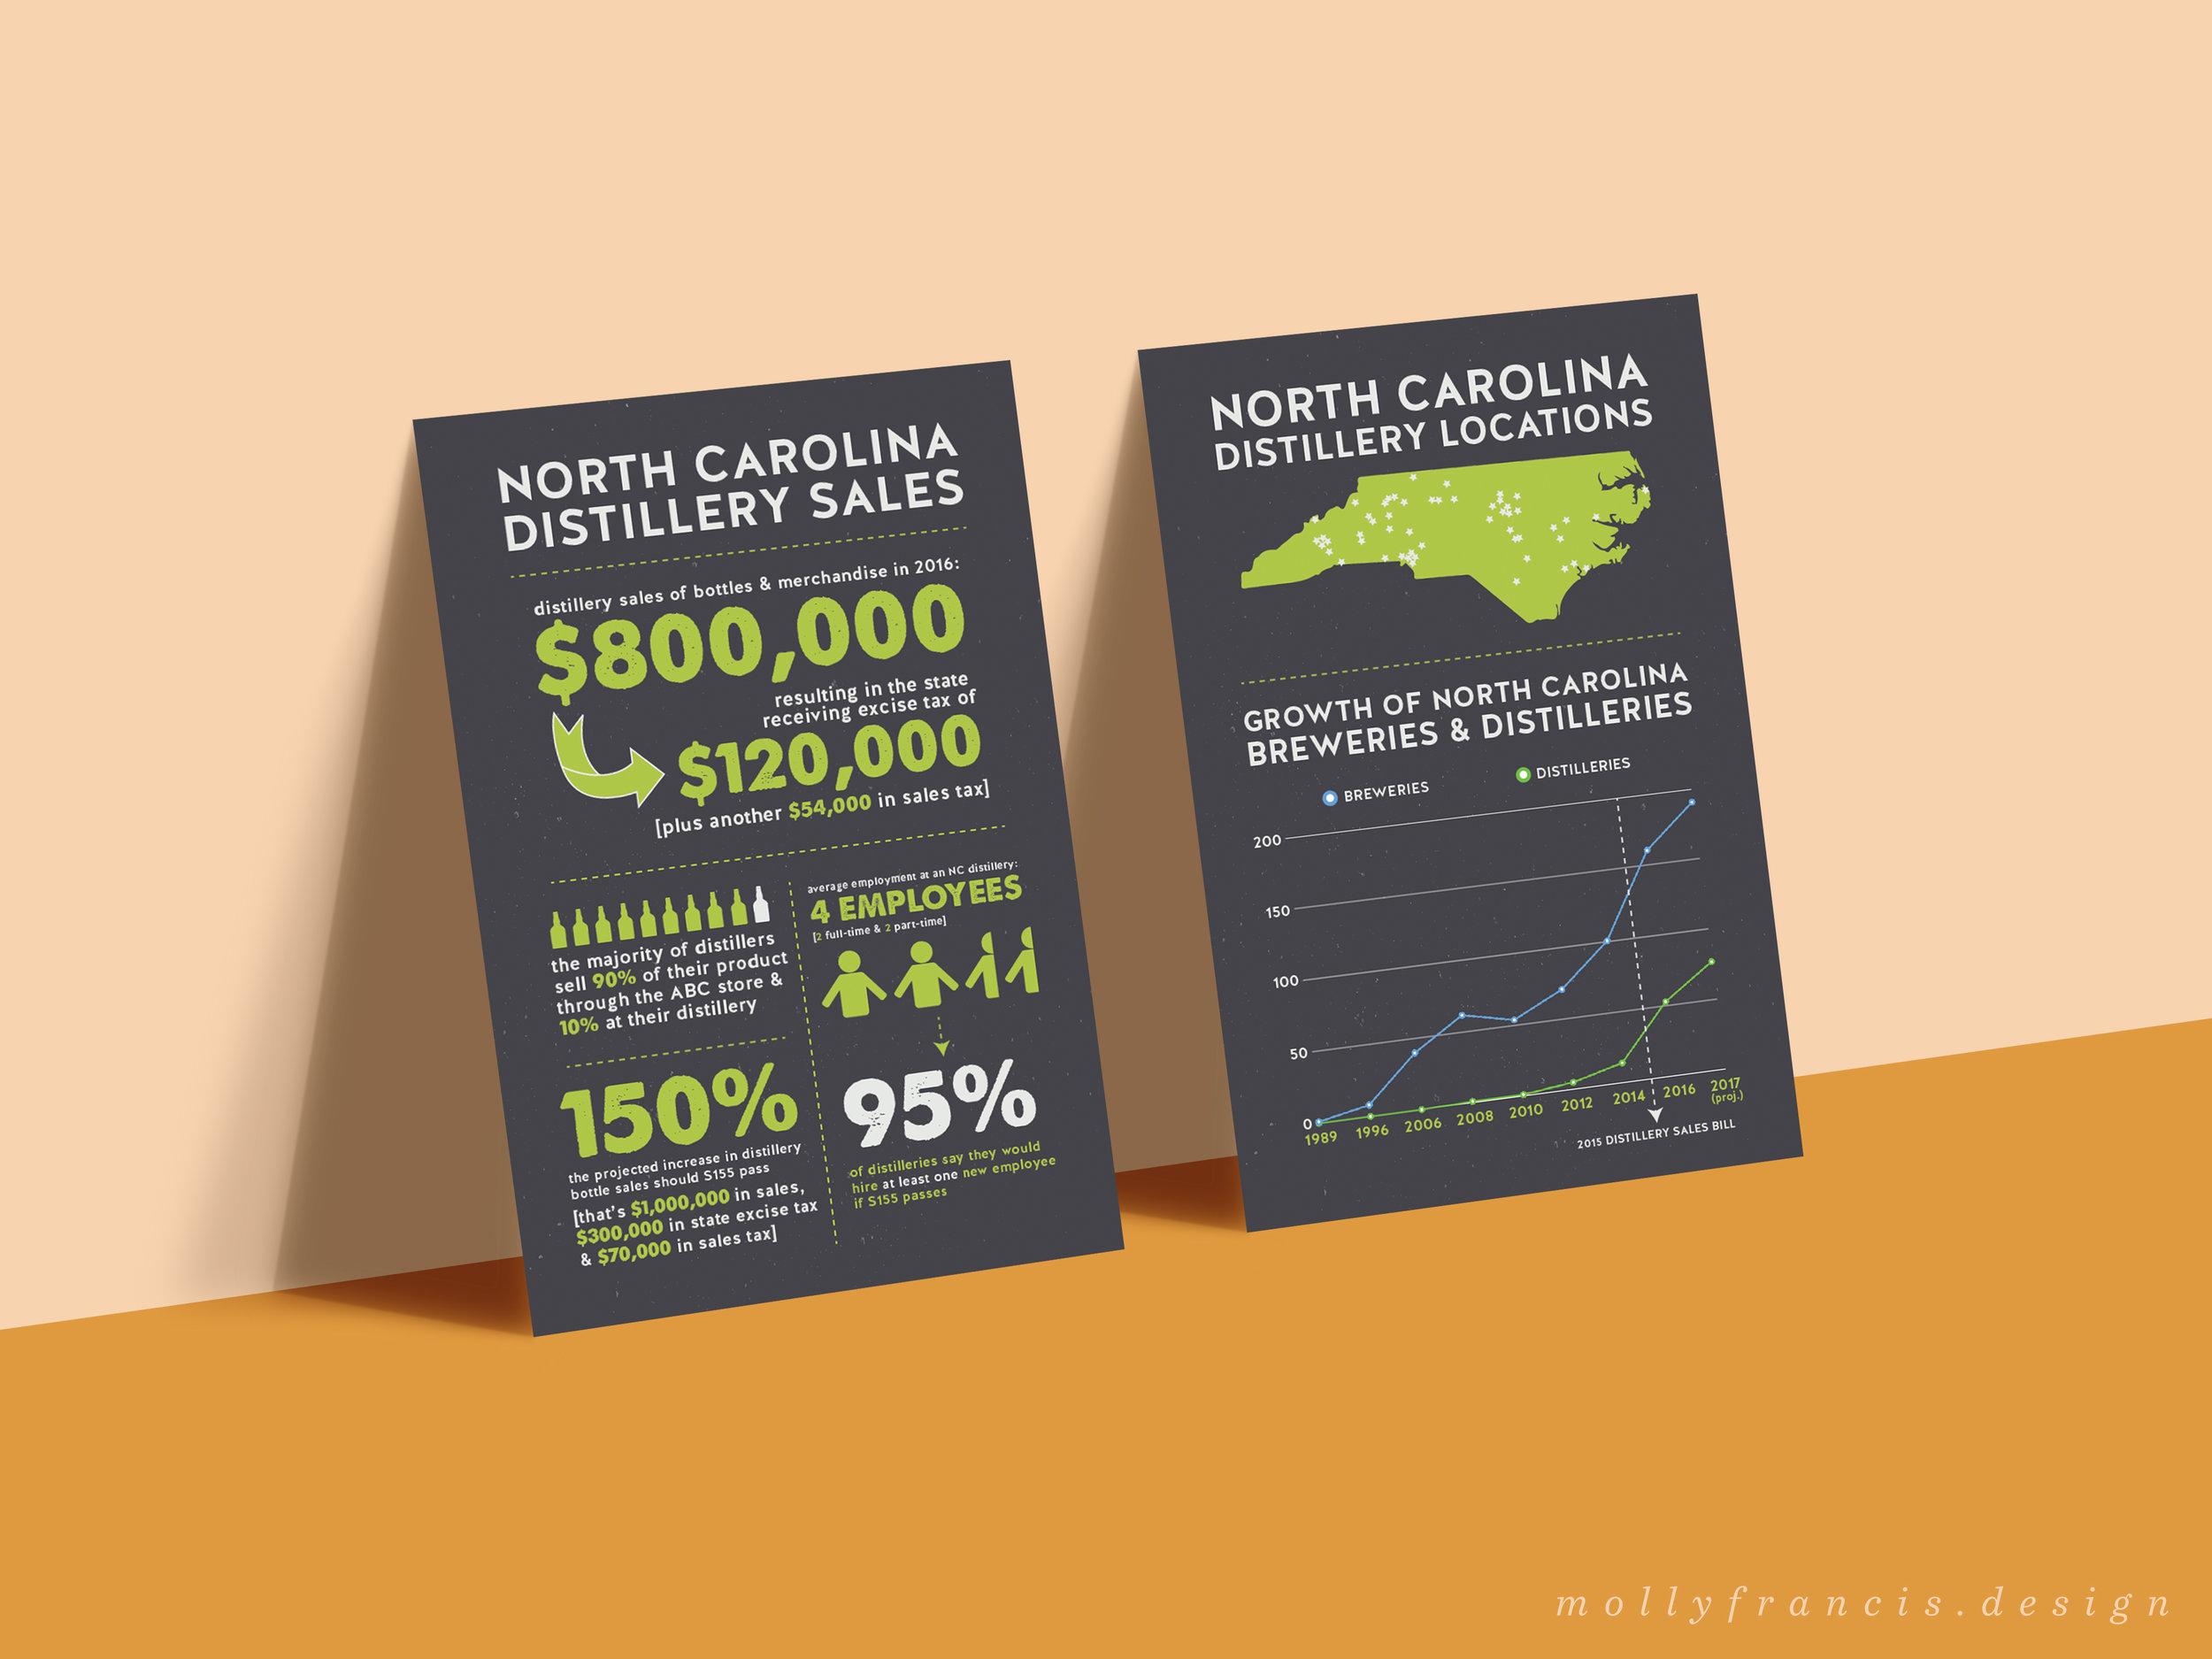 nc distilleries infographic